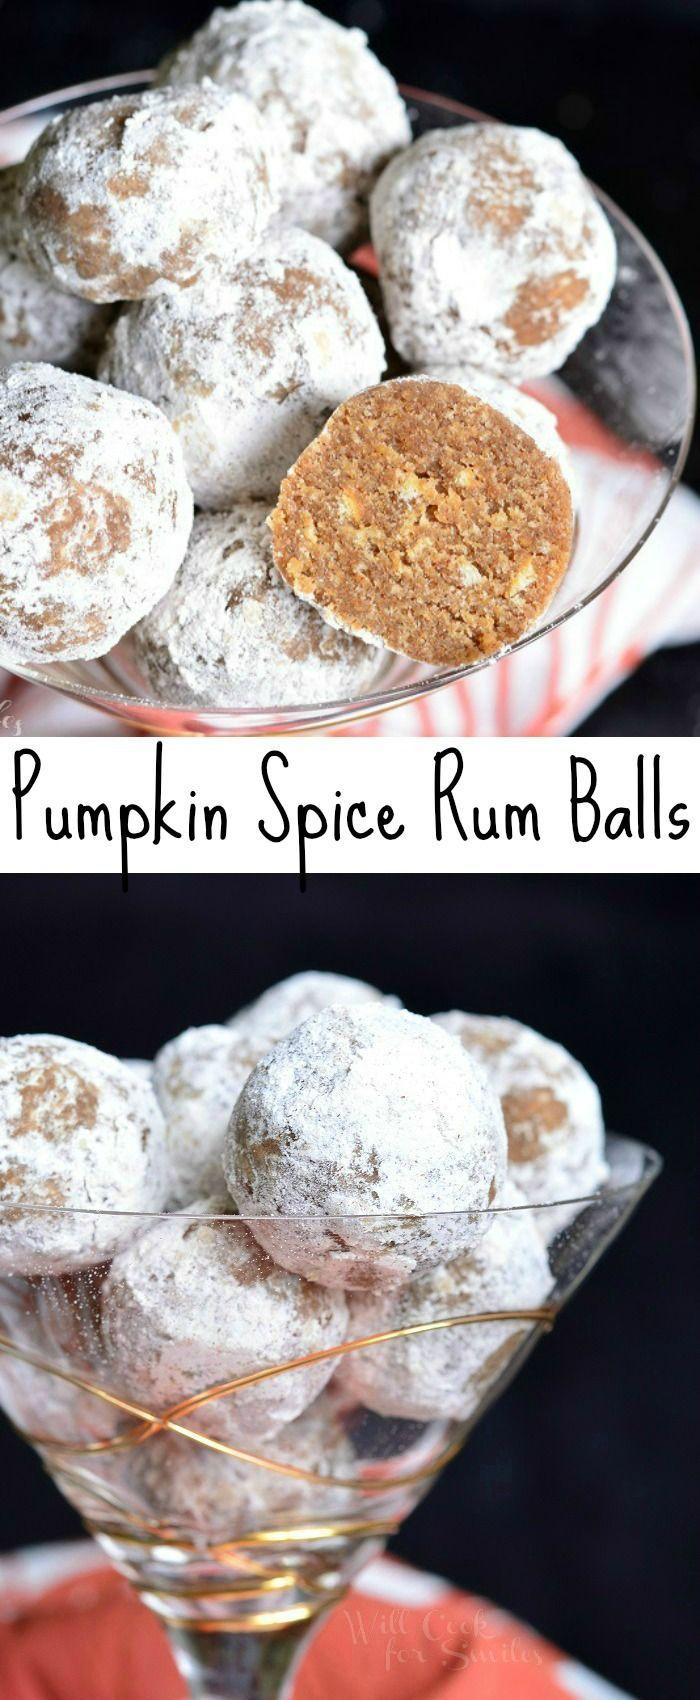 Pumpkin Spice Rum Balls | from willcookforsmiles.com #dessert #cookie